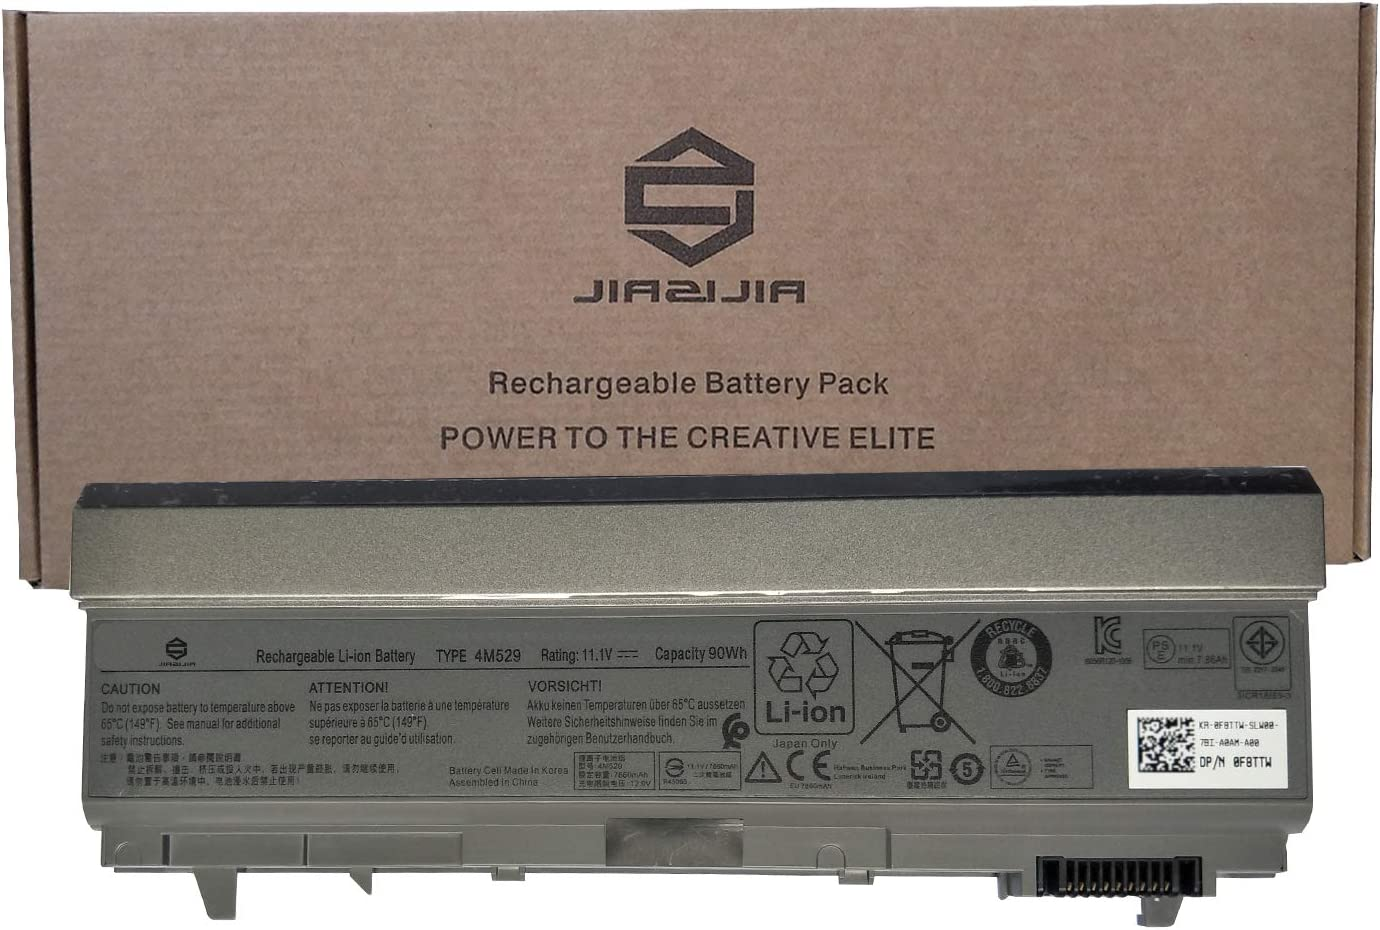 JIAZIJIA 4M529 Laptop Battery Replacement for Dell Latitude E6400 E6410 E6500 E6510 Precision M2400 M4400 M4500 M6500 Series Notebook 0F8TTW F8TTW Black 11.1V 90Wh 7850mAh